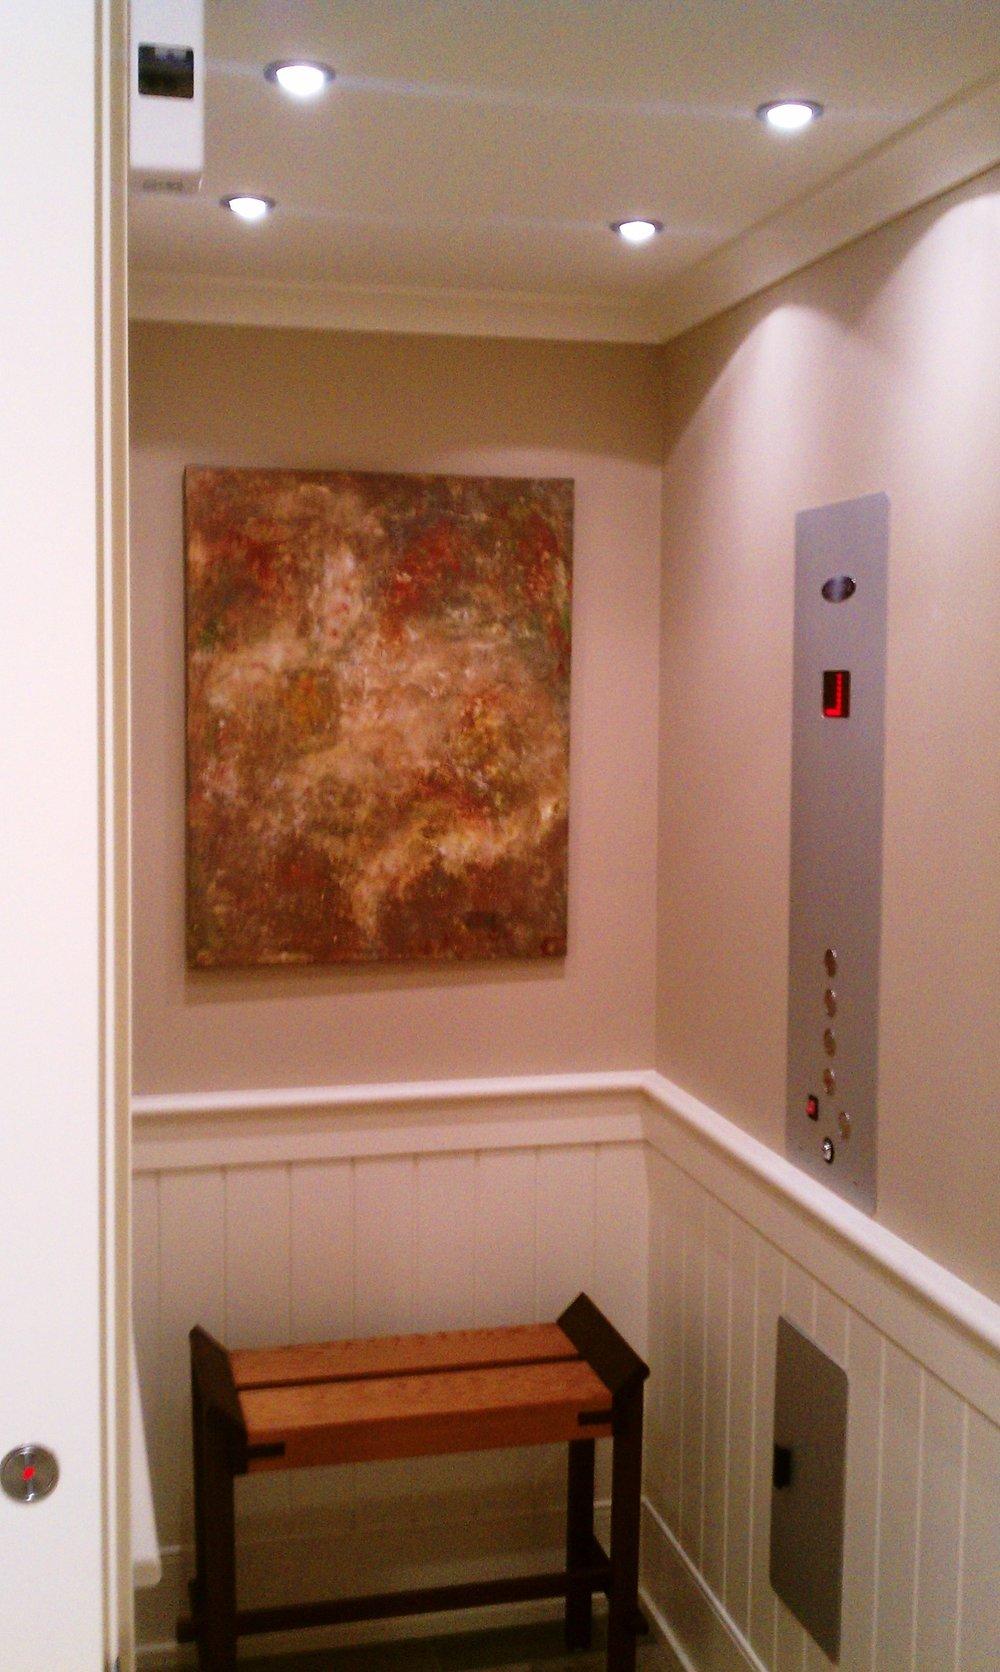 elevatorpic.jpg